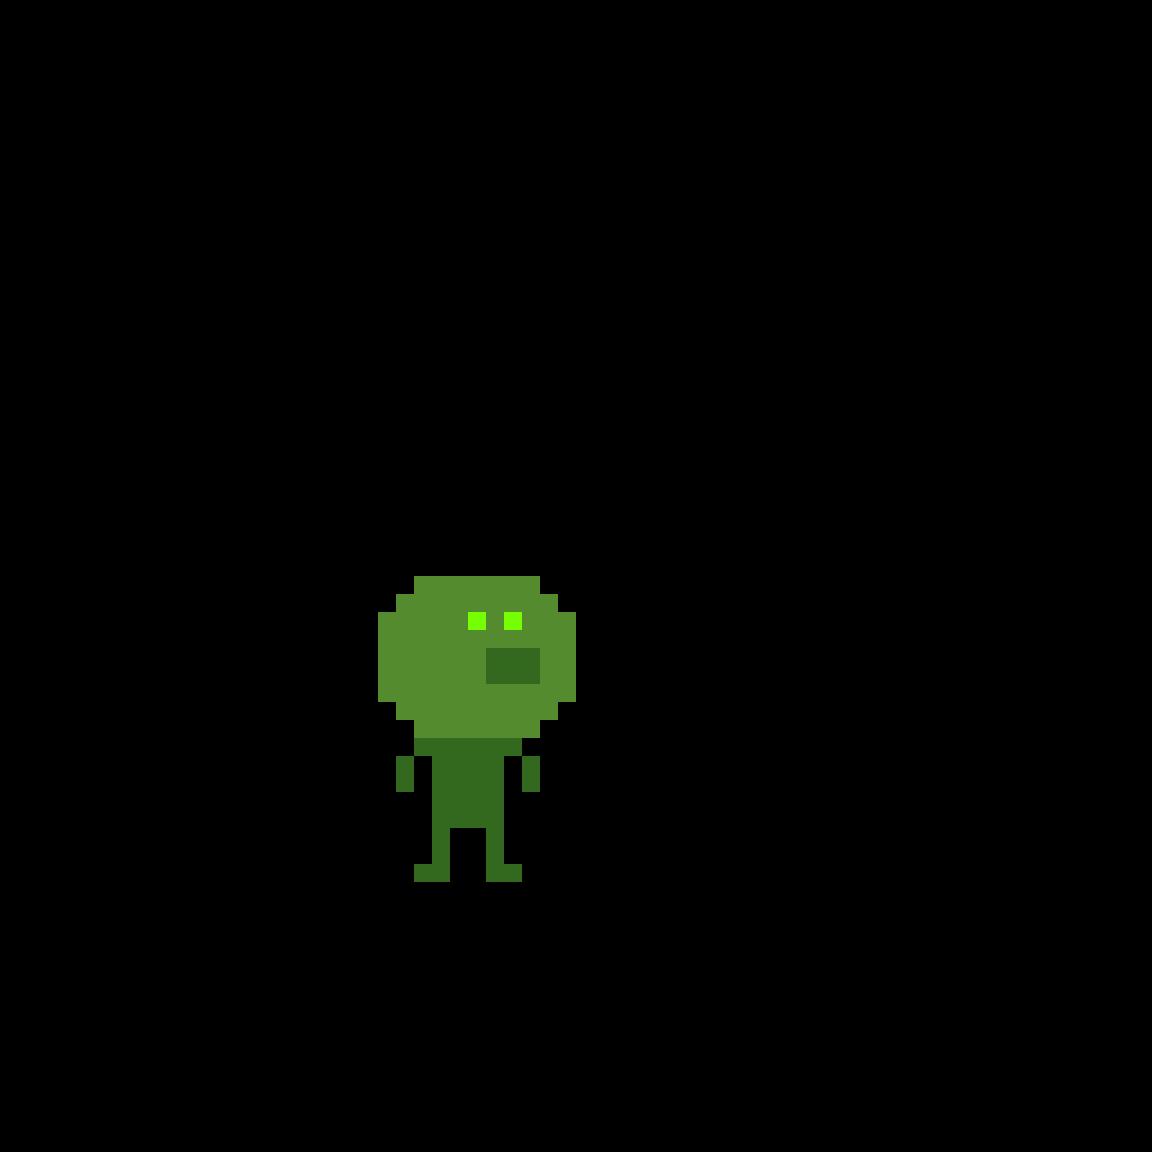 NES zombie sprite by MrVortex365